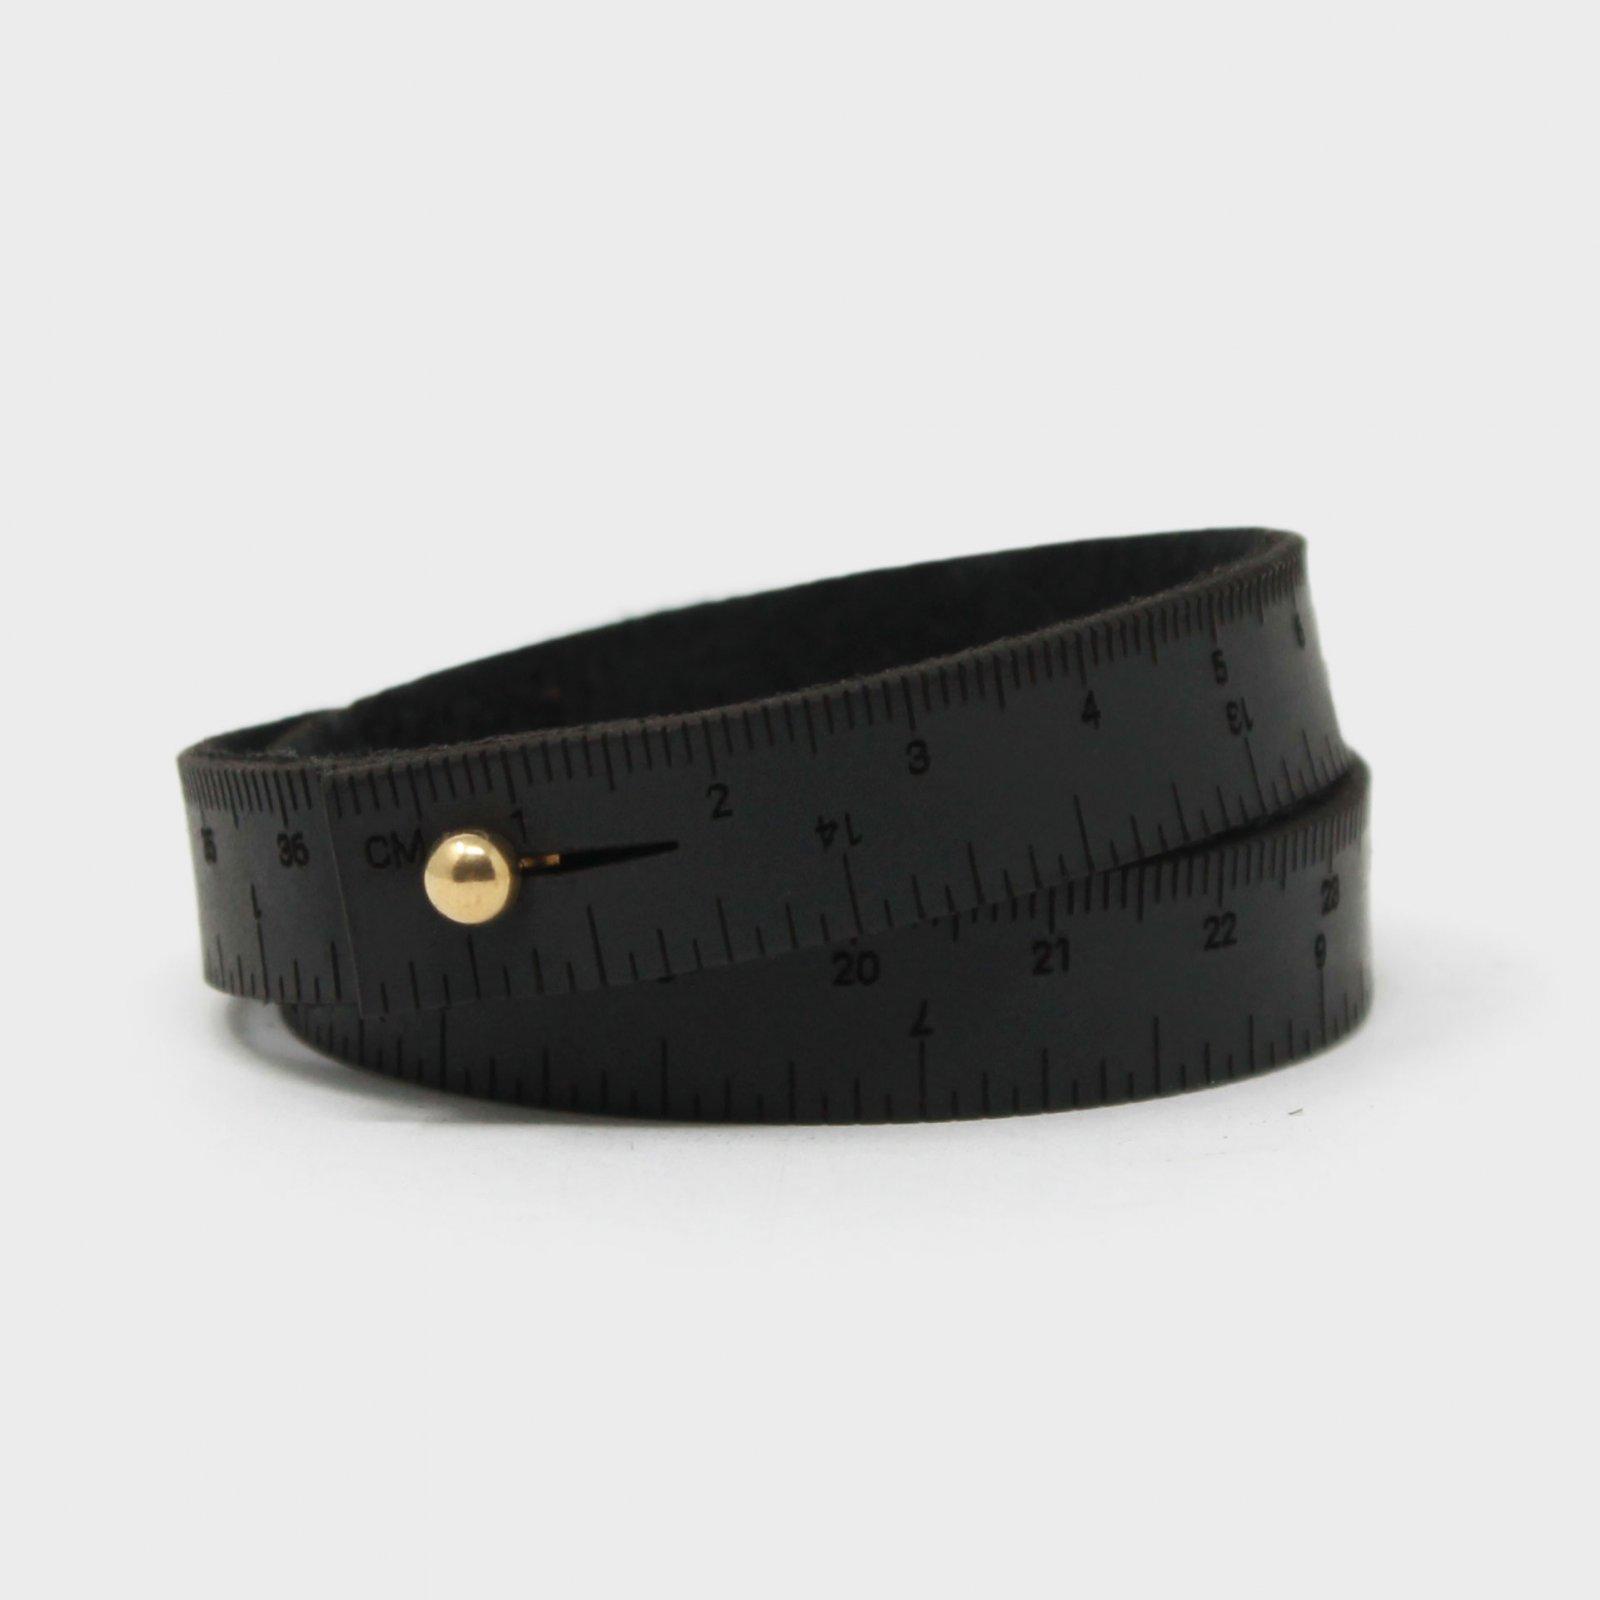 Wrist Ruler - Black